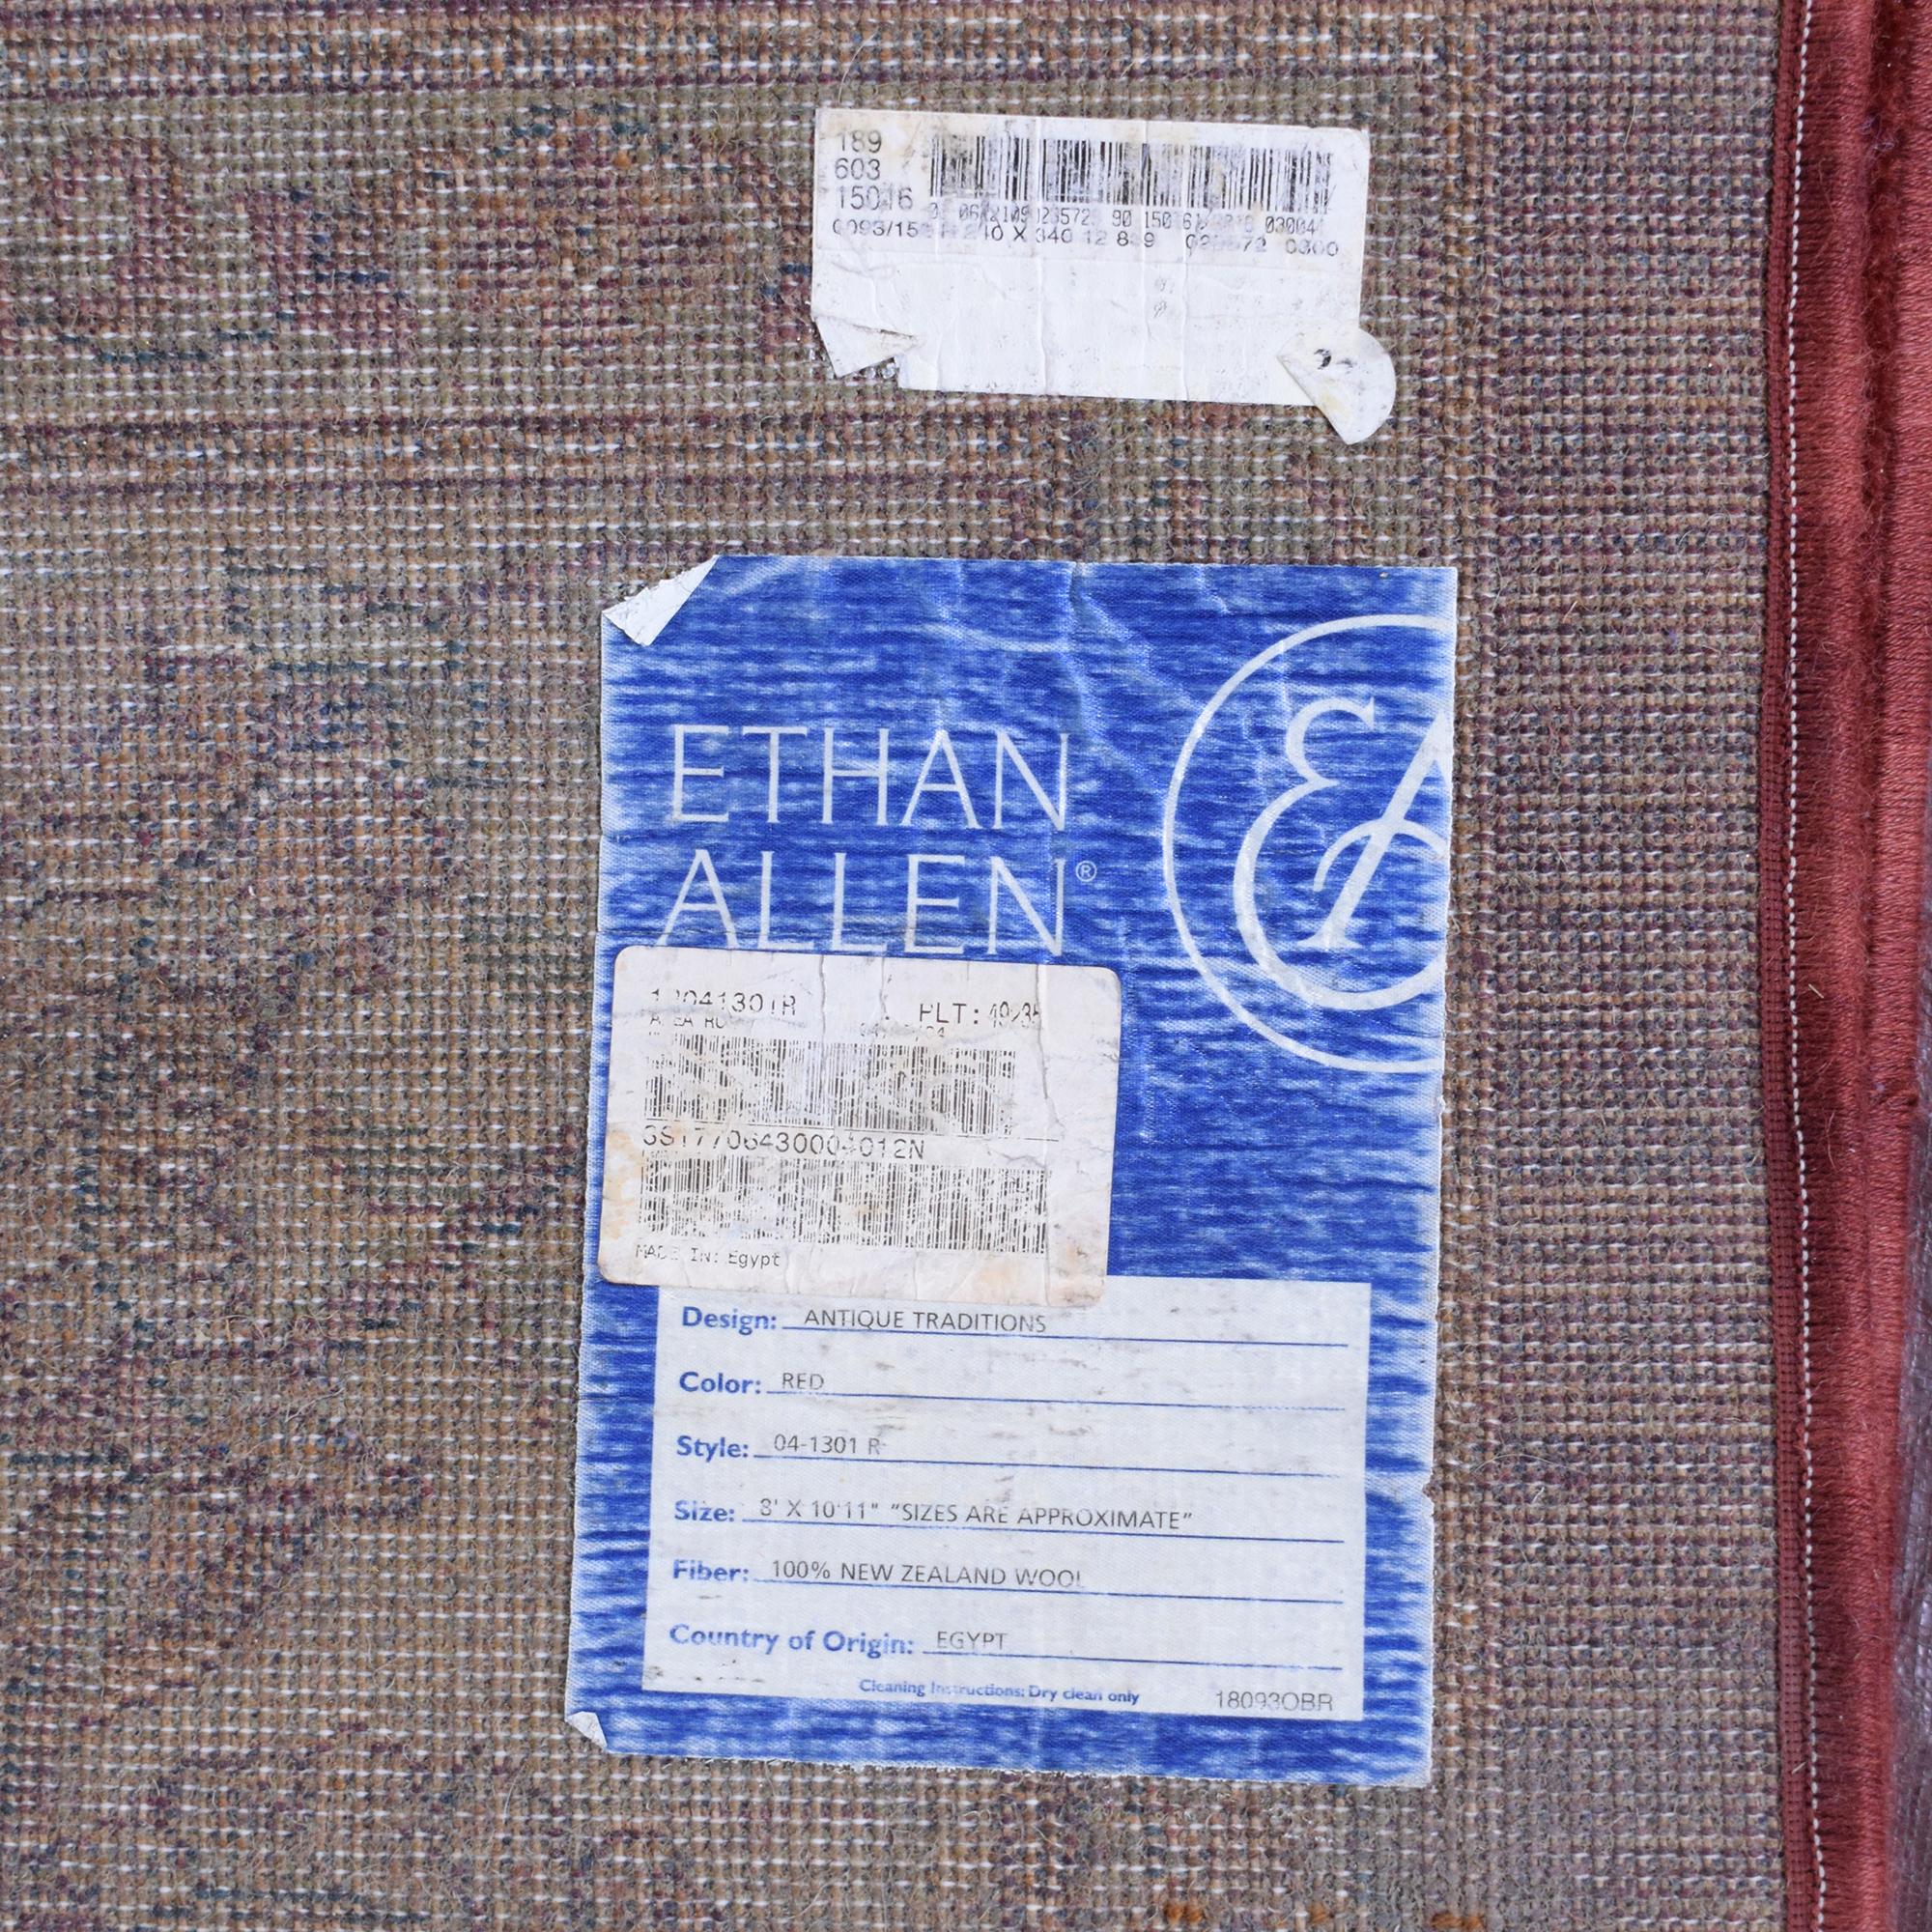 Ethan Allen Ethan Allen Antique Traditions Area Rug second hand